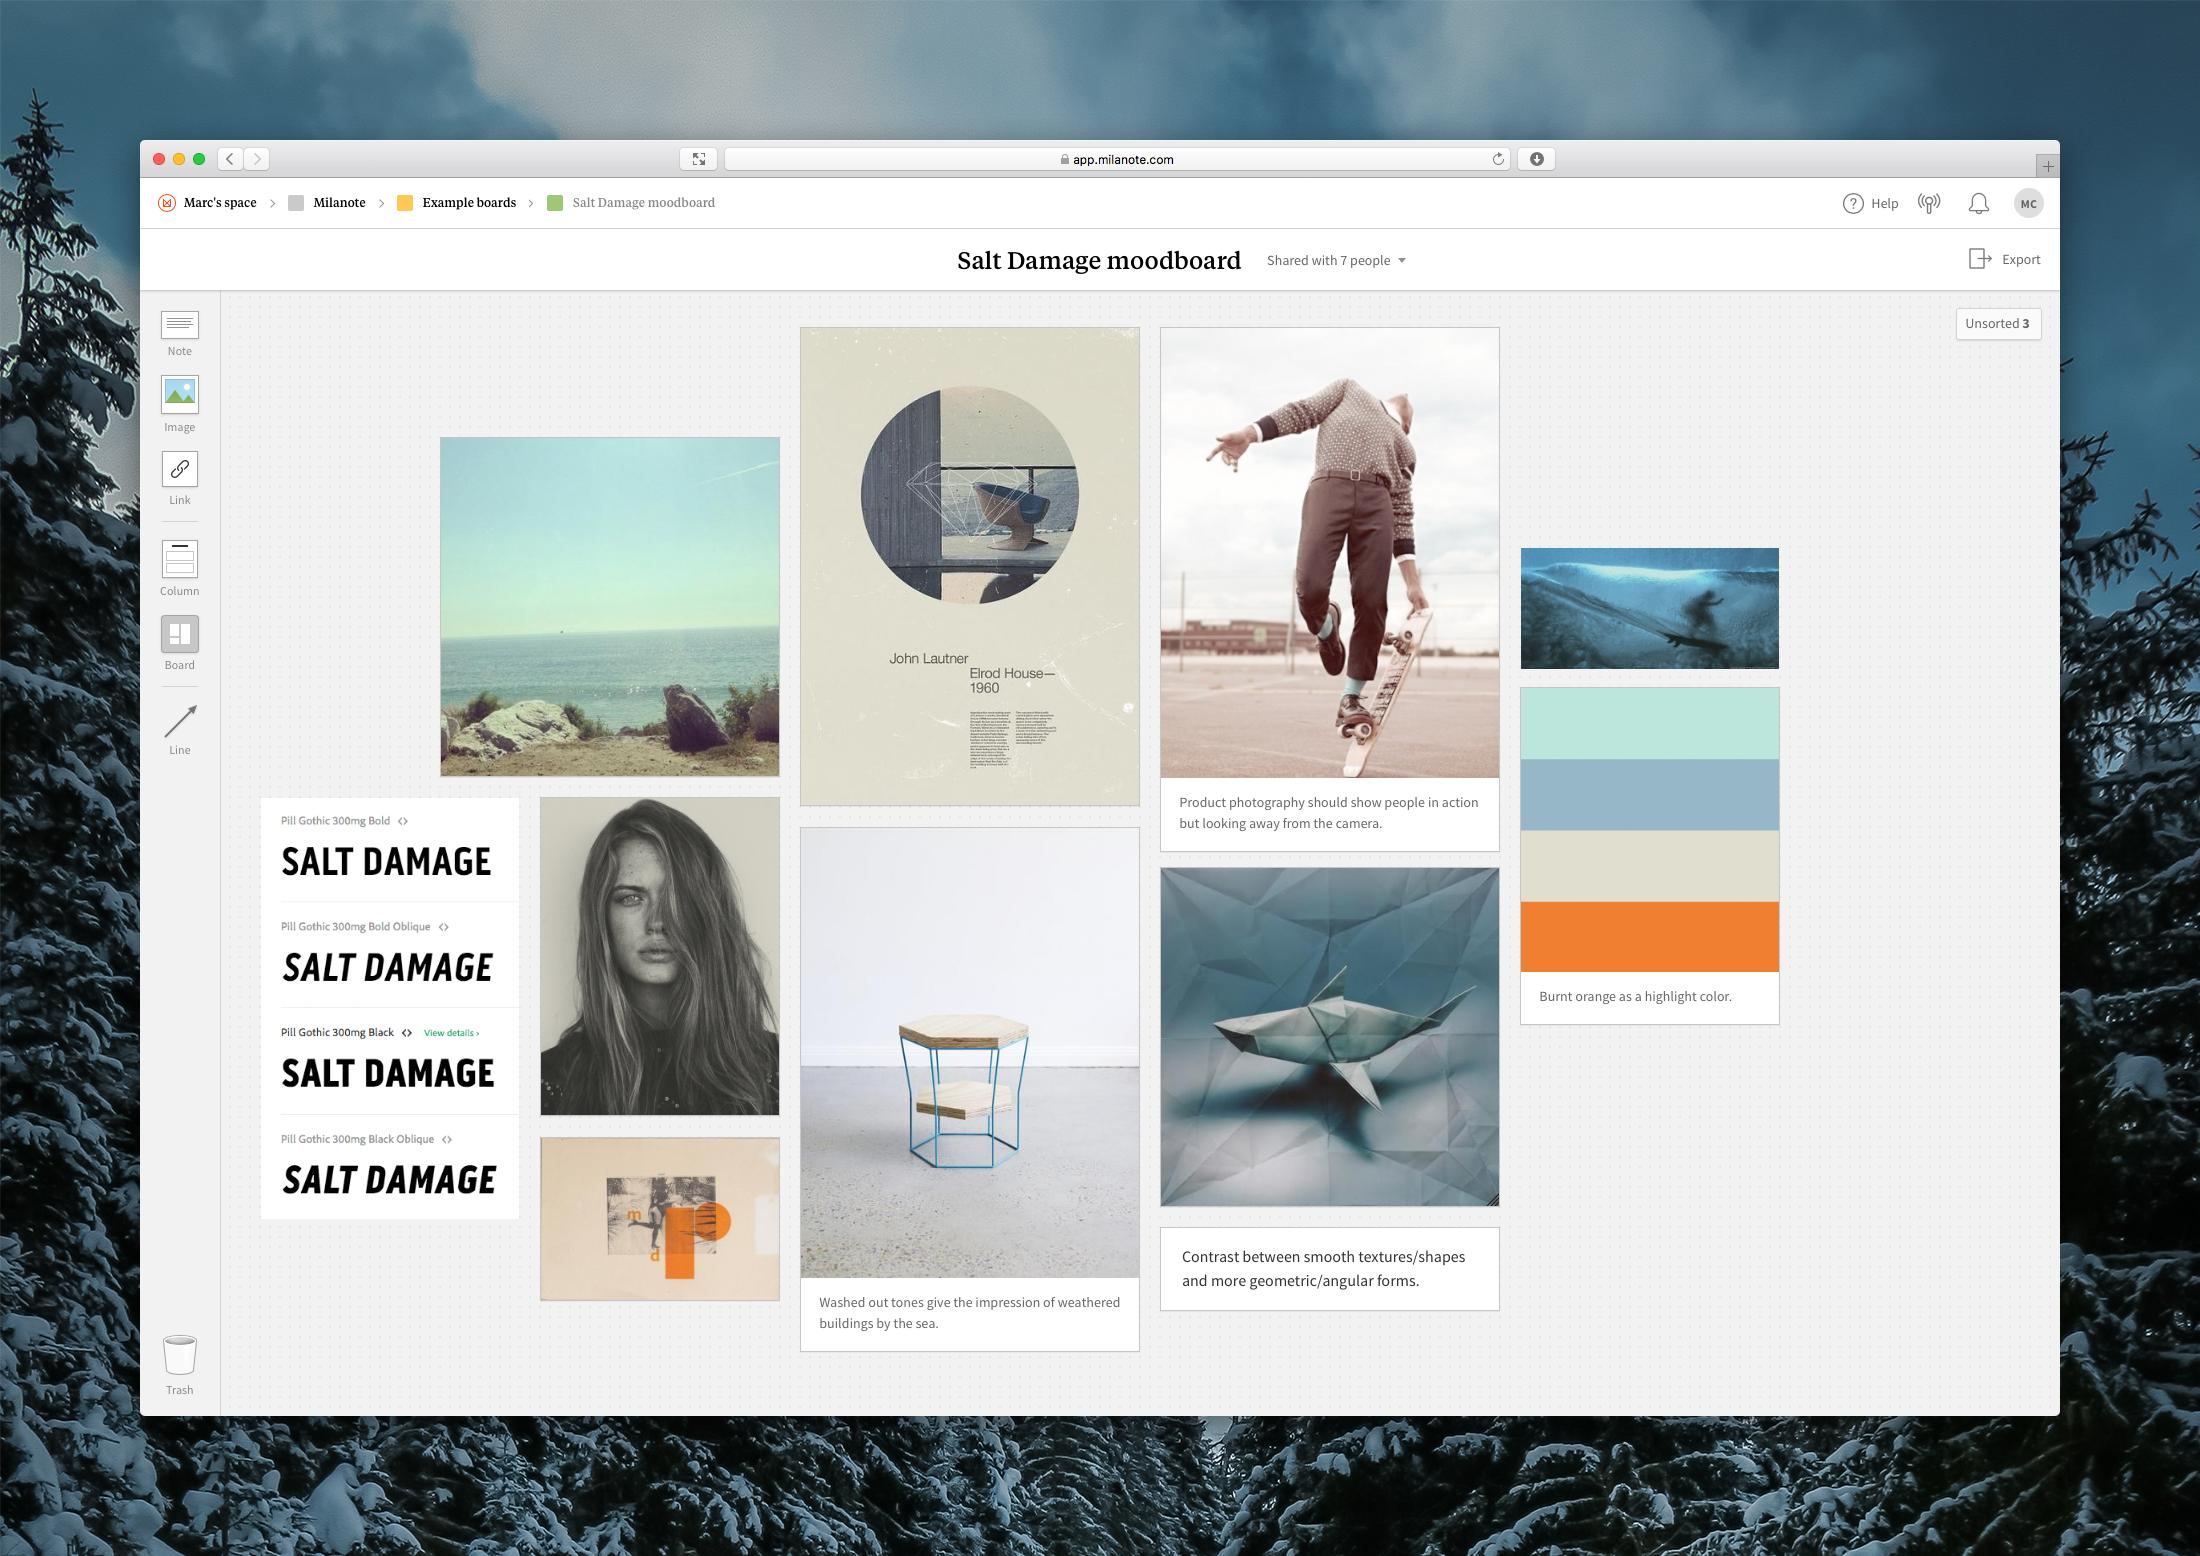 Milanote Demo - Creating a Moodboard